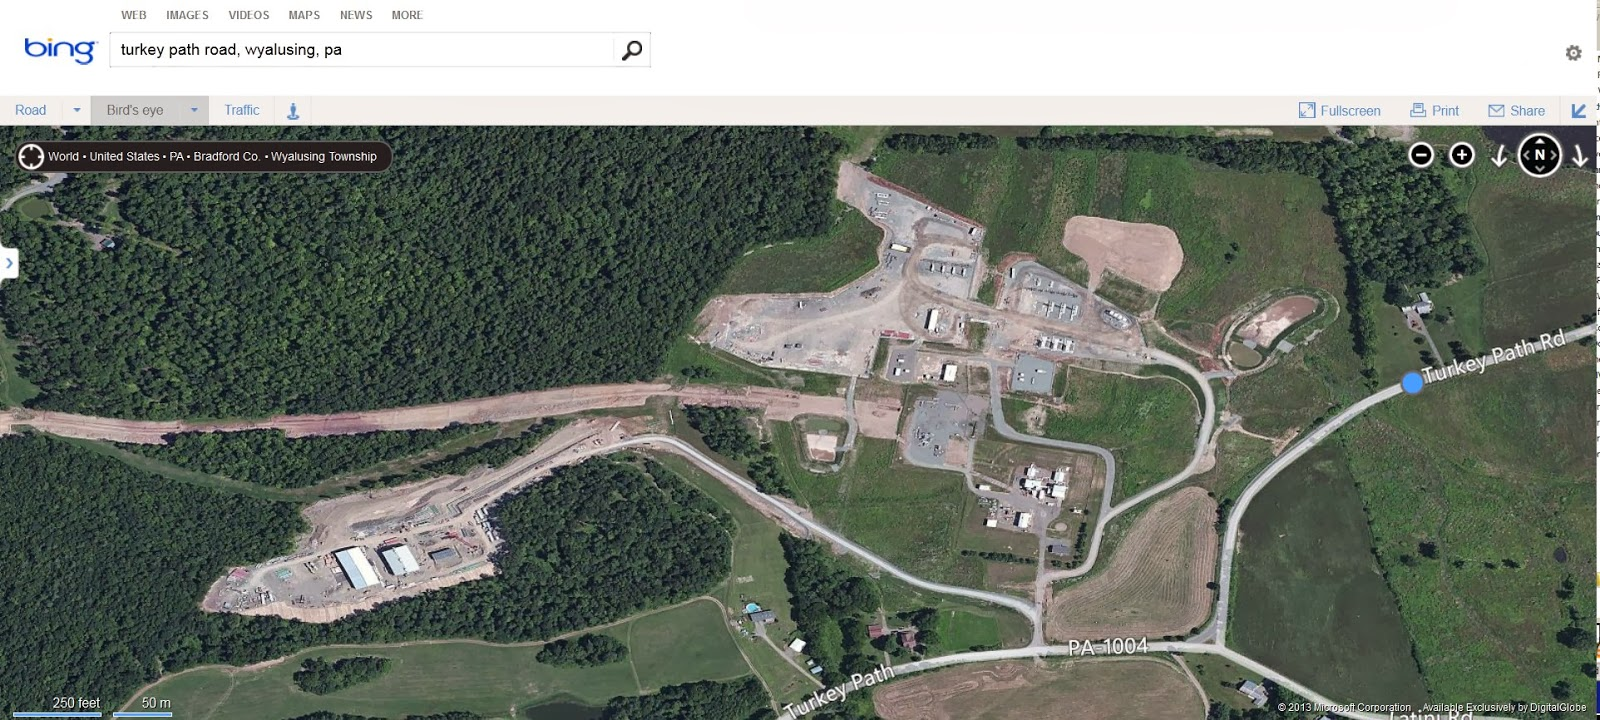 Nearest Natural Gas Station